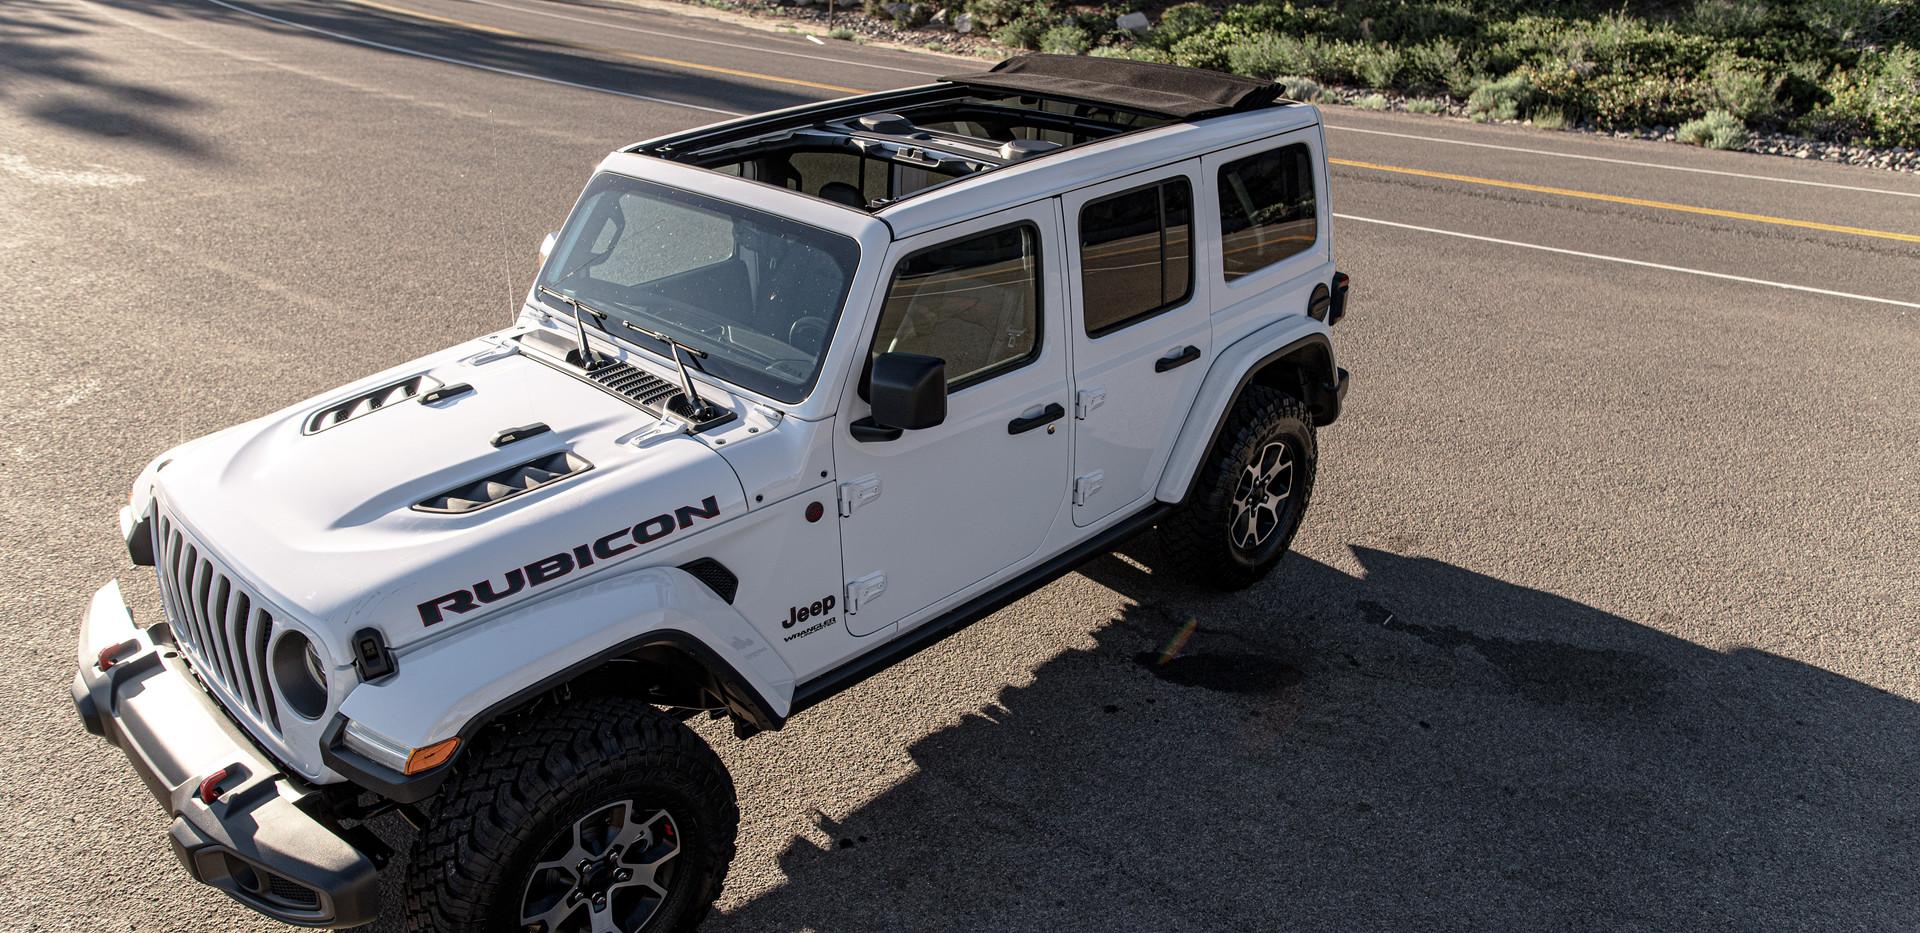 Jeep Wrangler Unlimited Rubicon 4WD